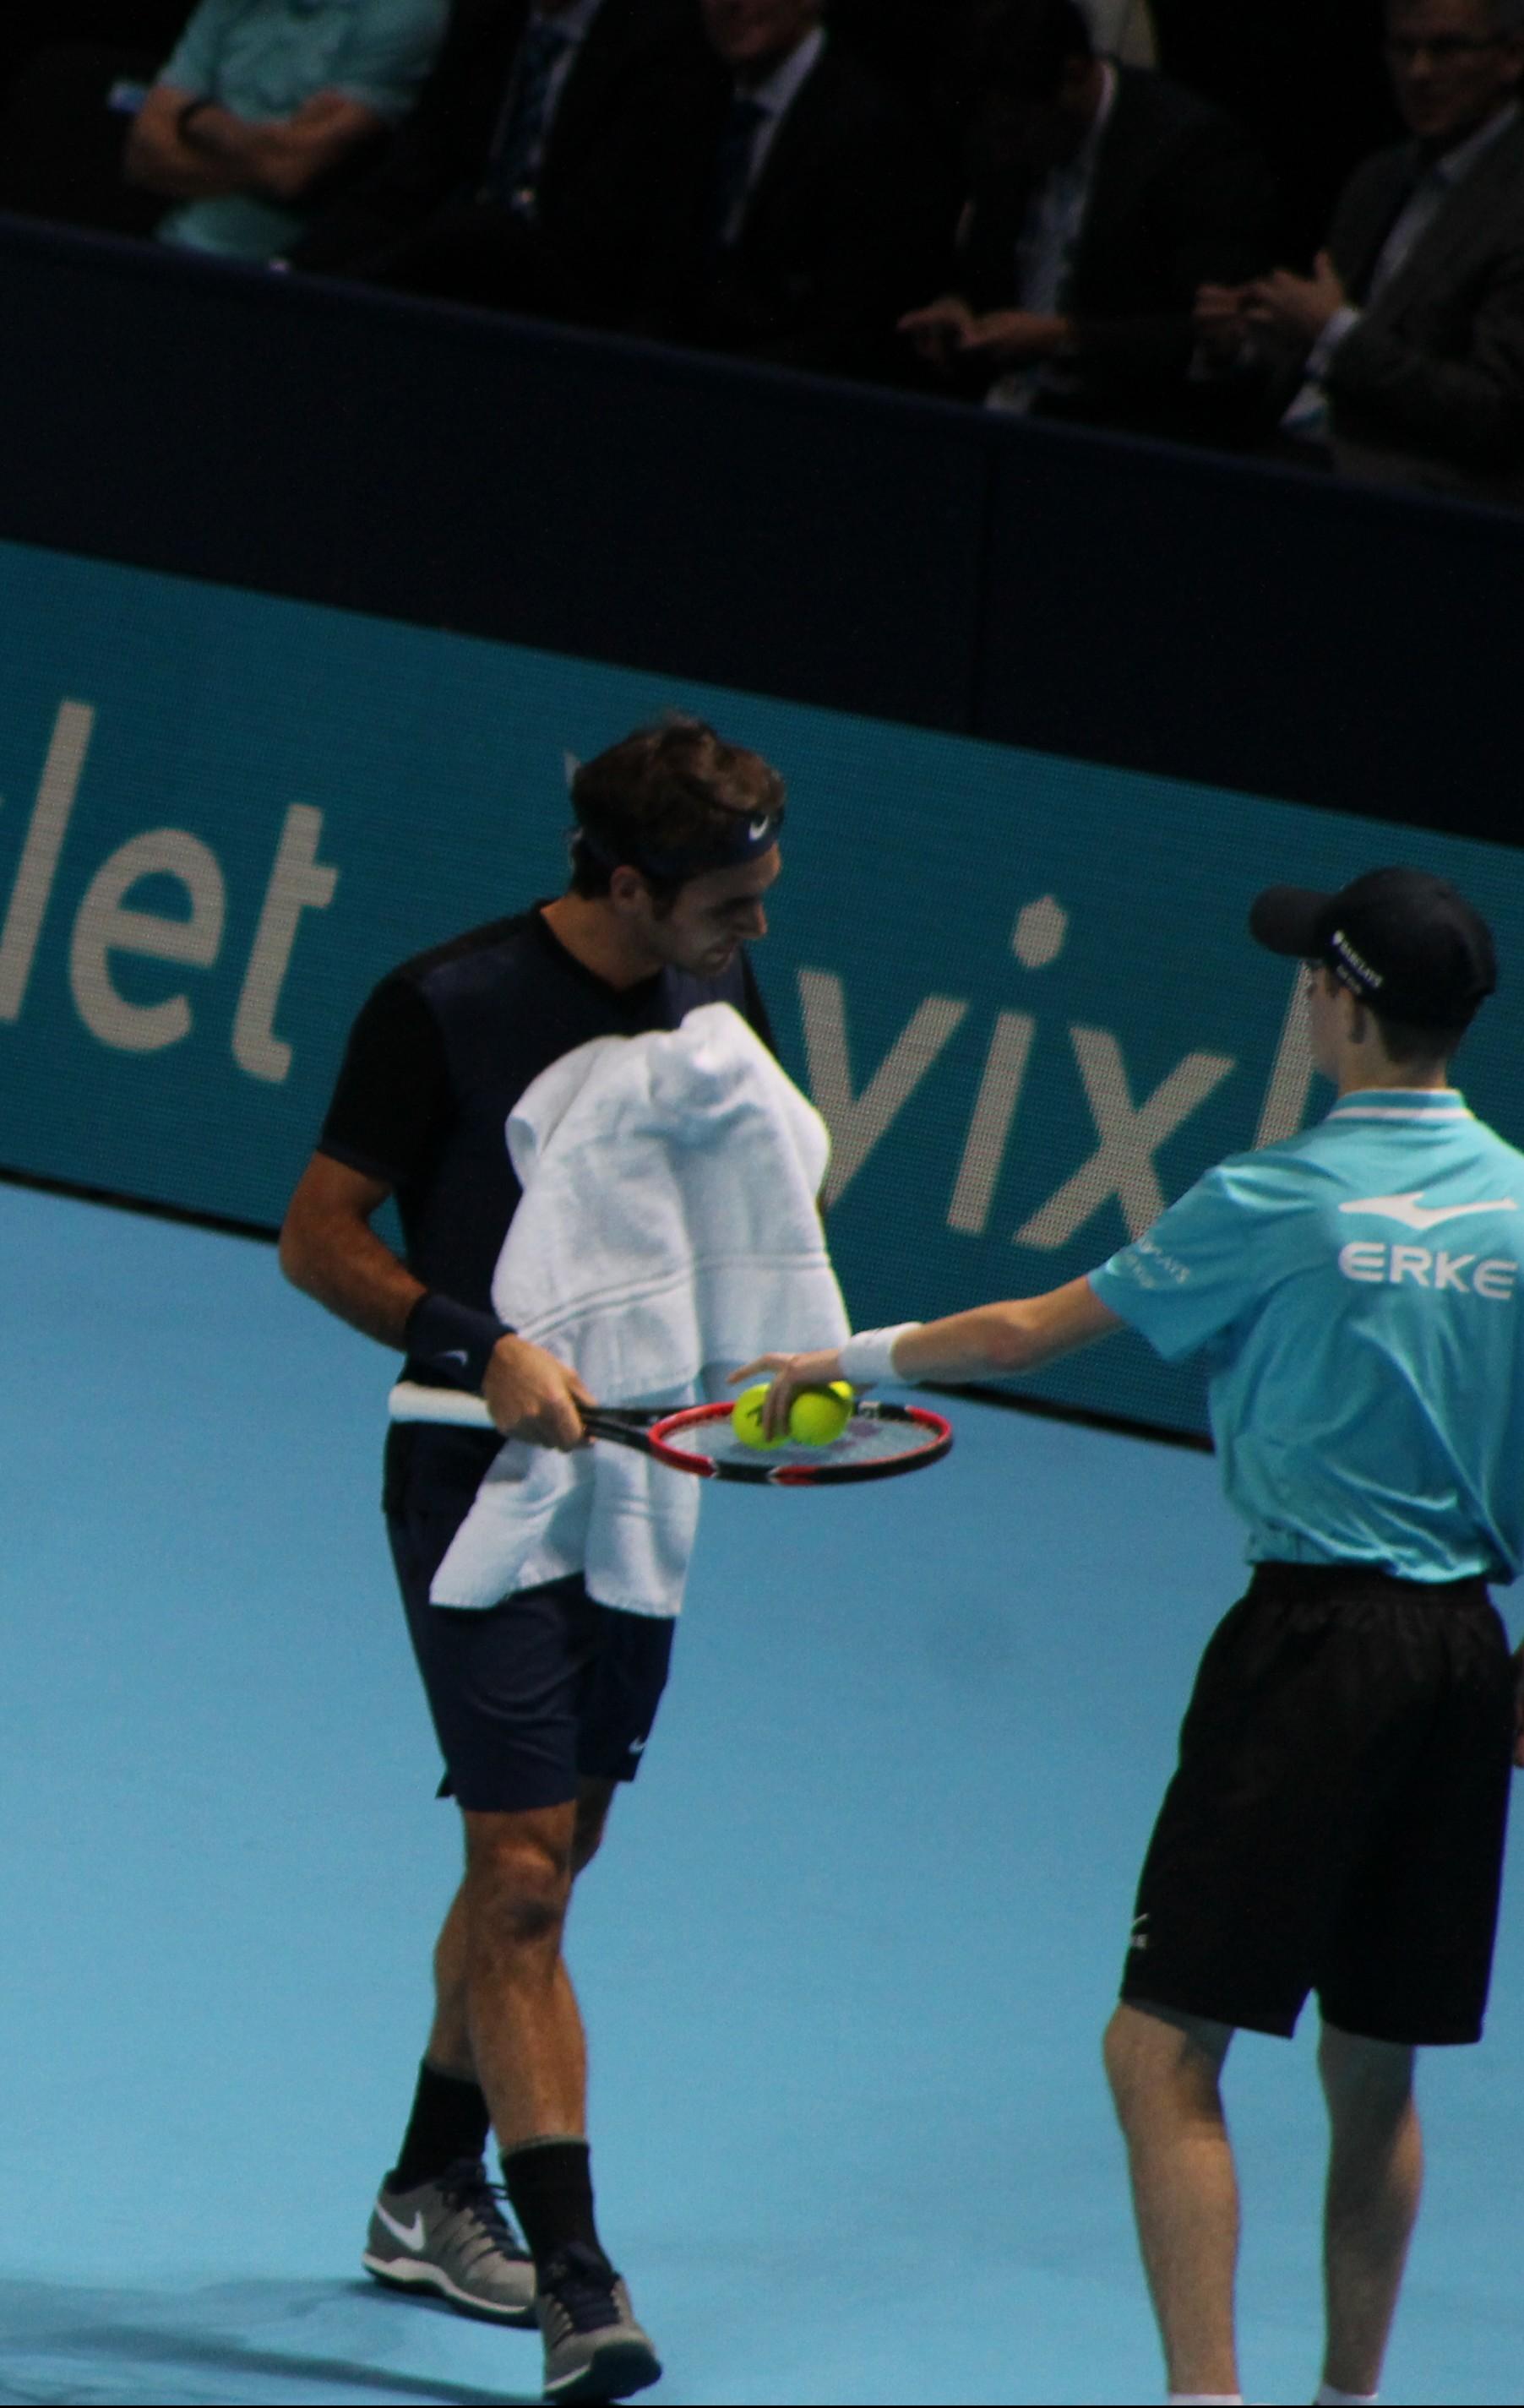 Roger Federer at the O2